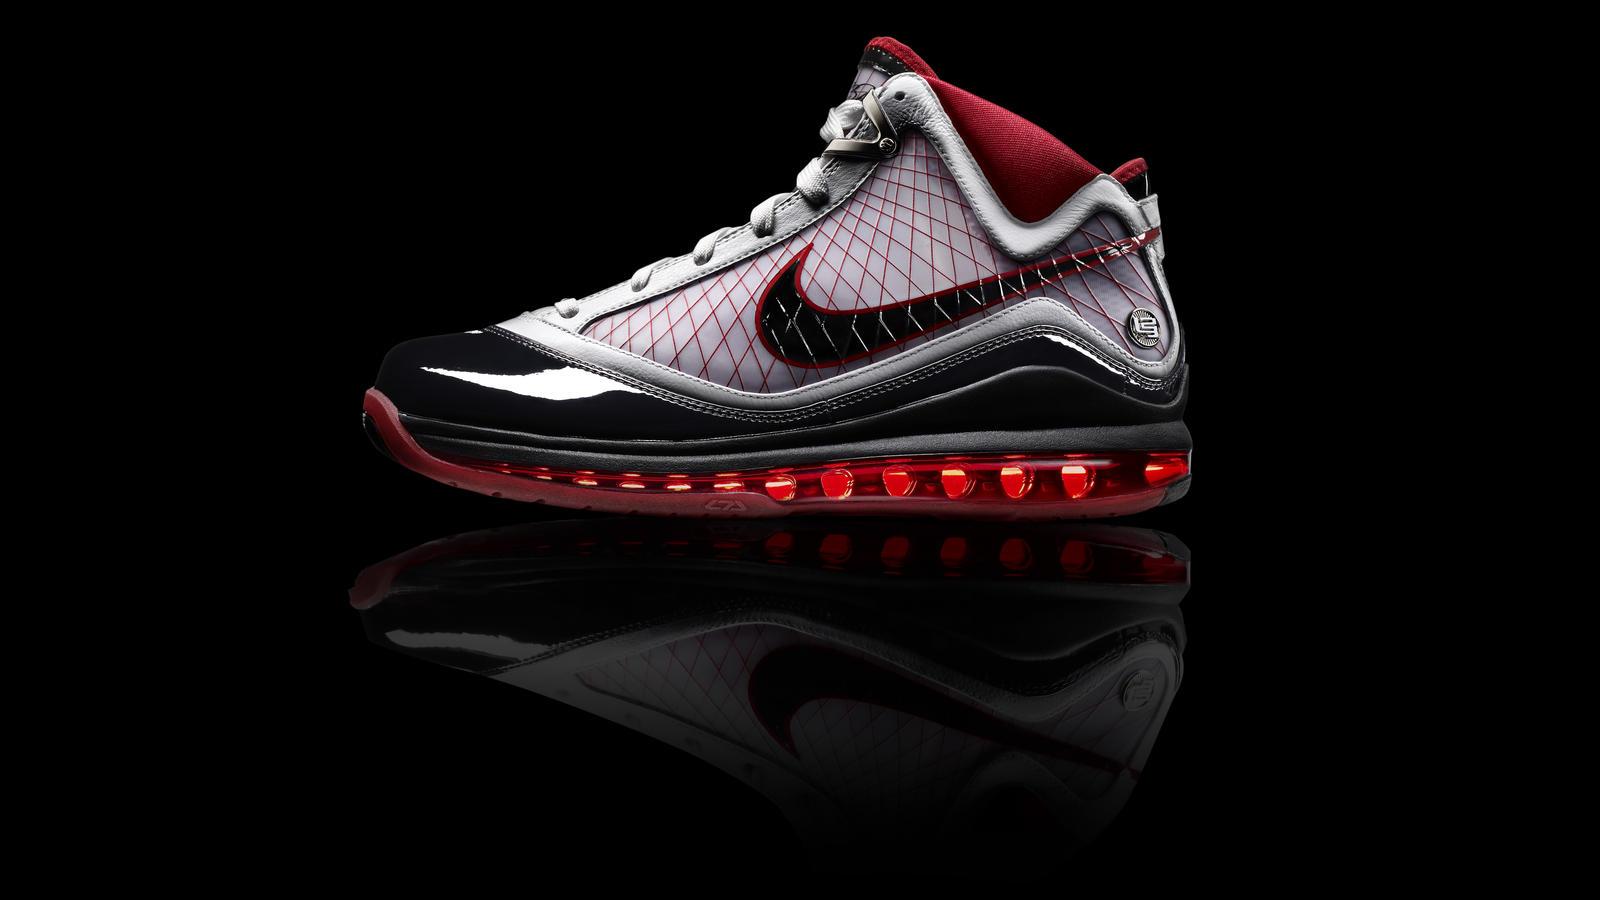 the latest 745aa 9b240 Nike, LeBron James introduce the Air Max LeBron VII - Nike News